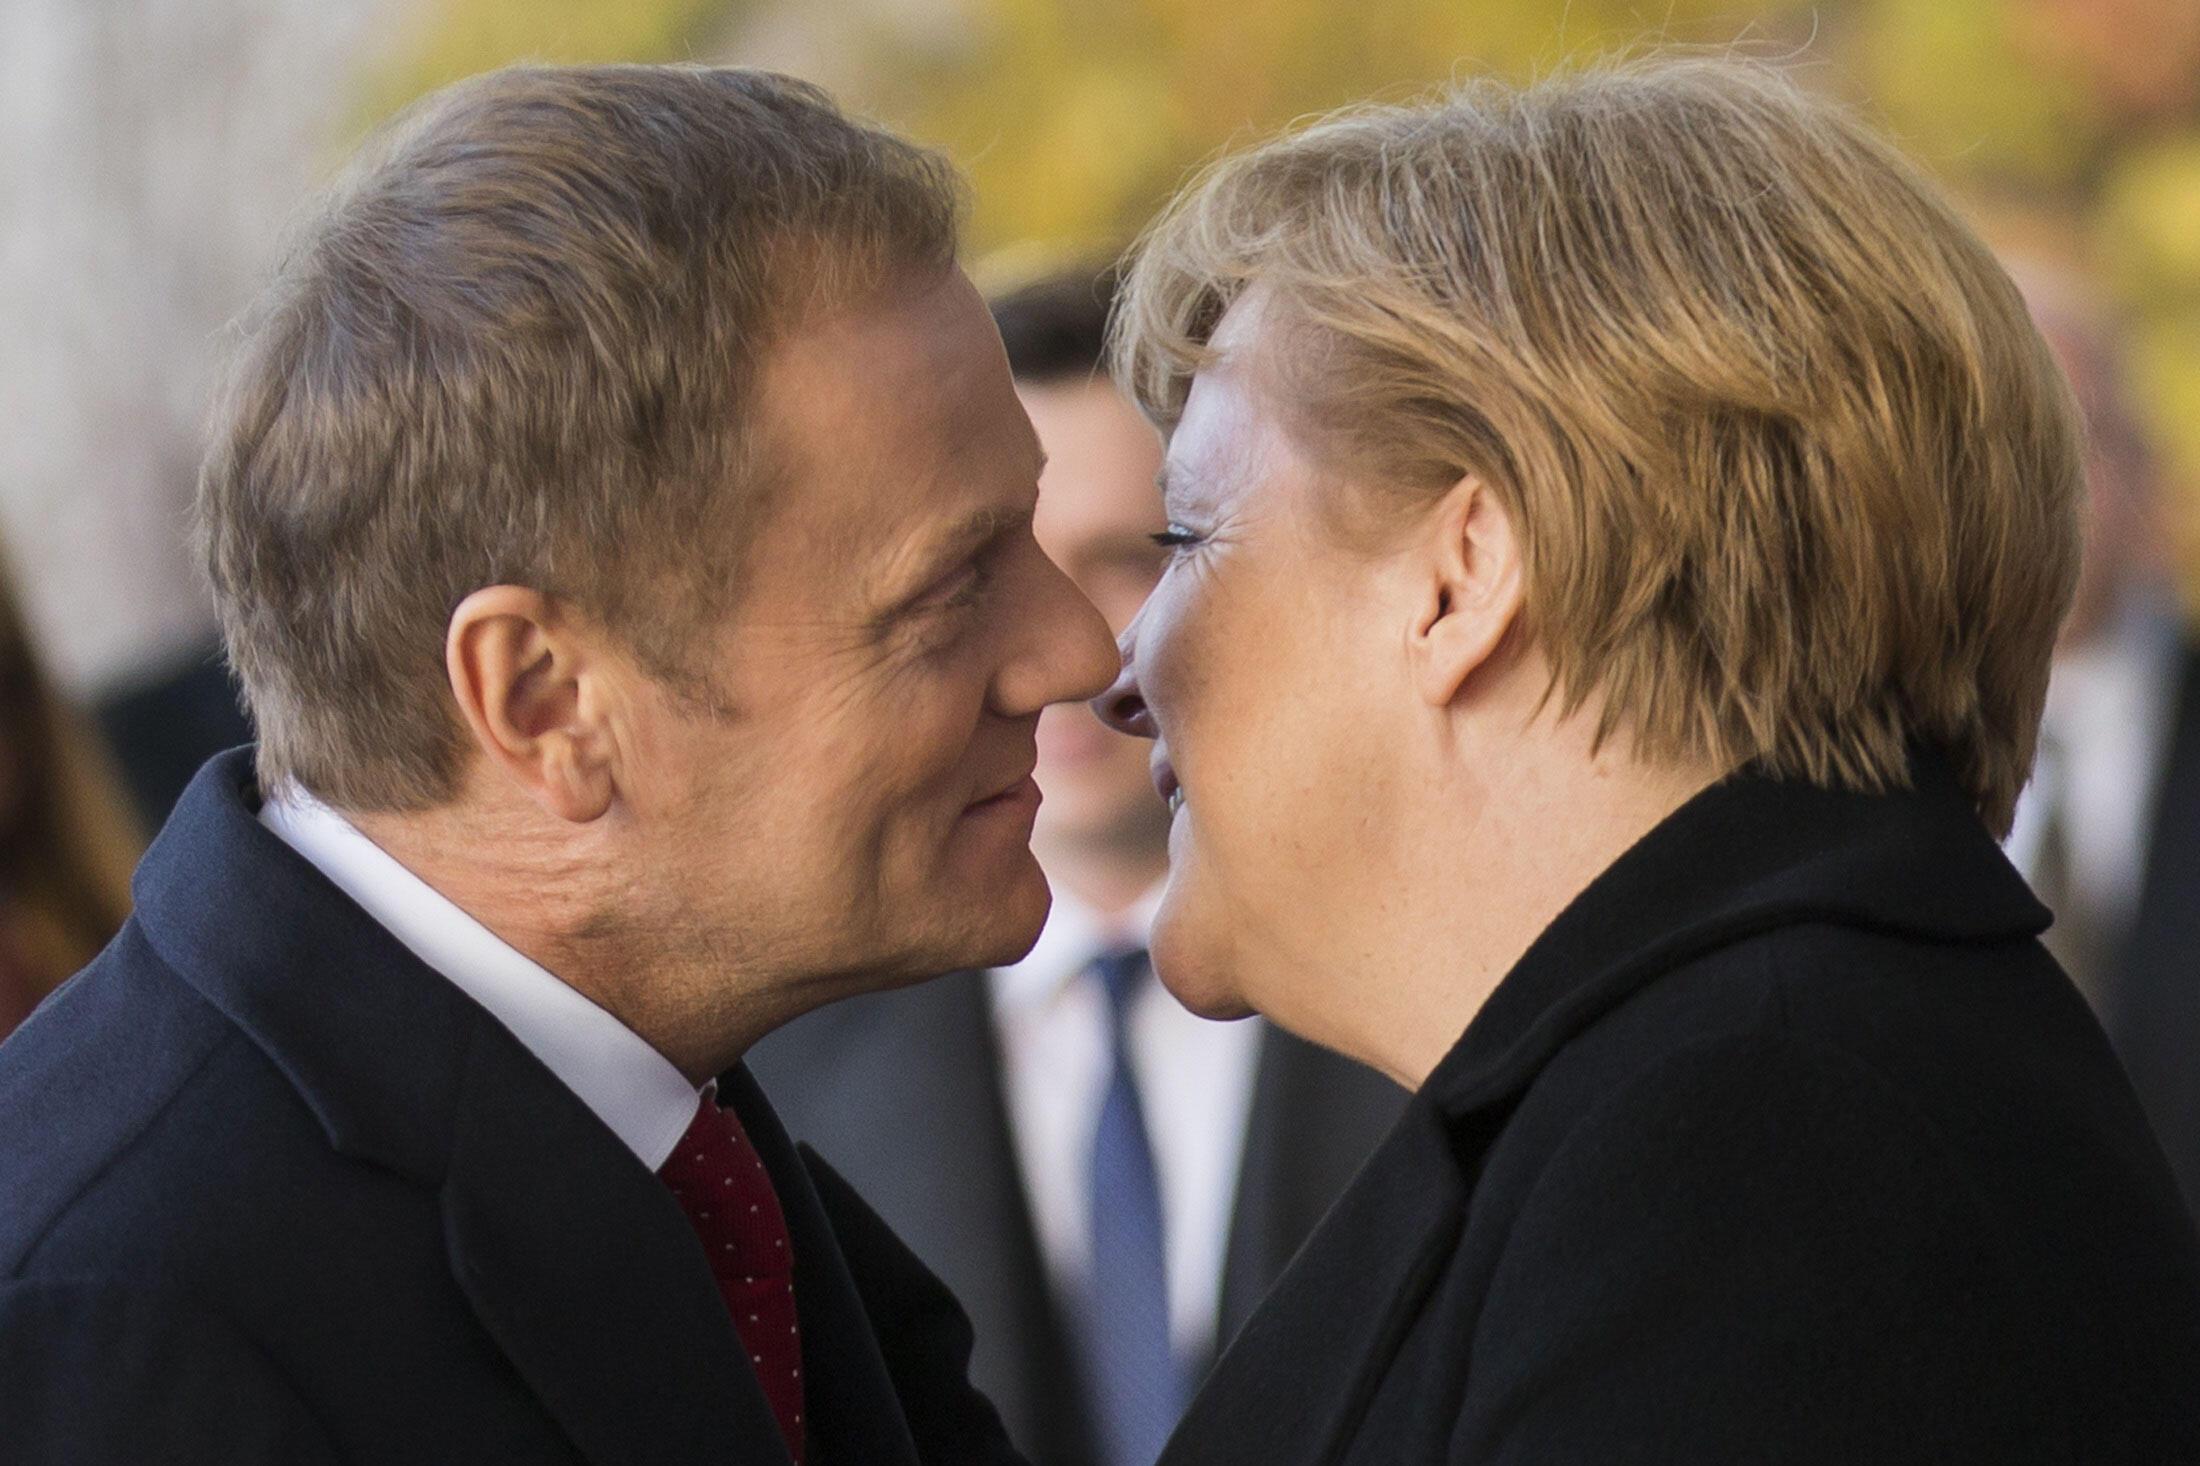 Germanophone, Donald Tusk a l'oreille d'Angela Merkel.